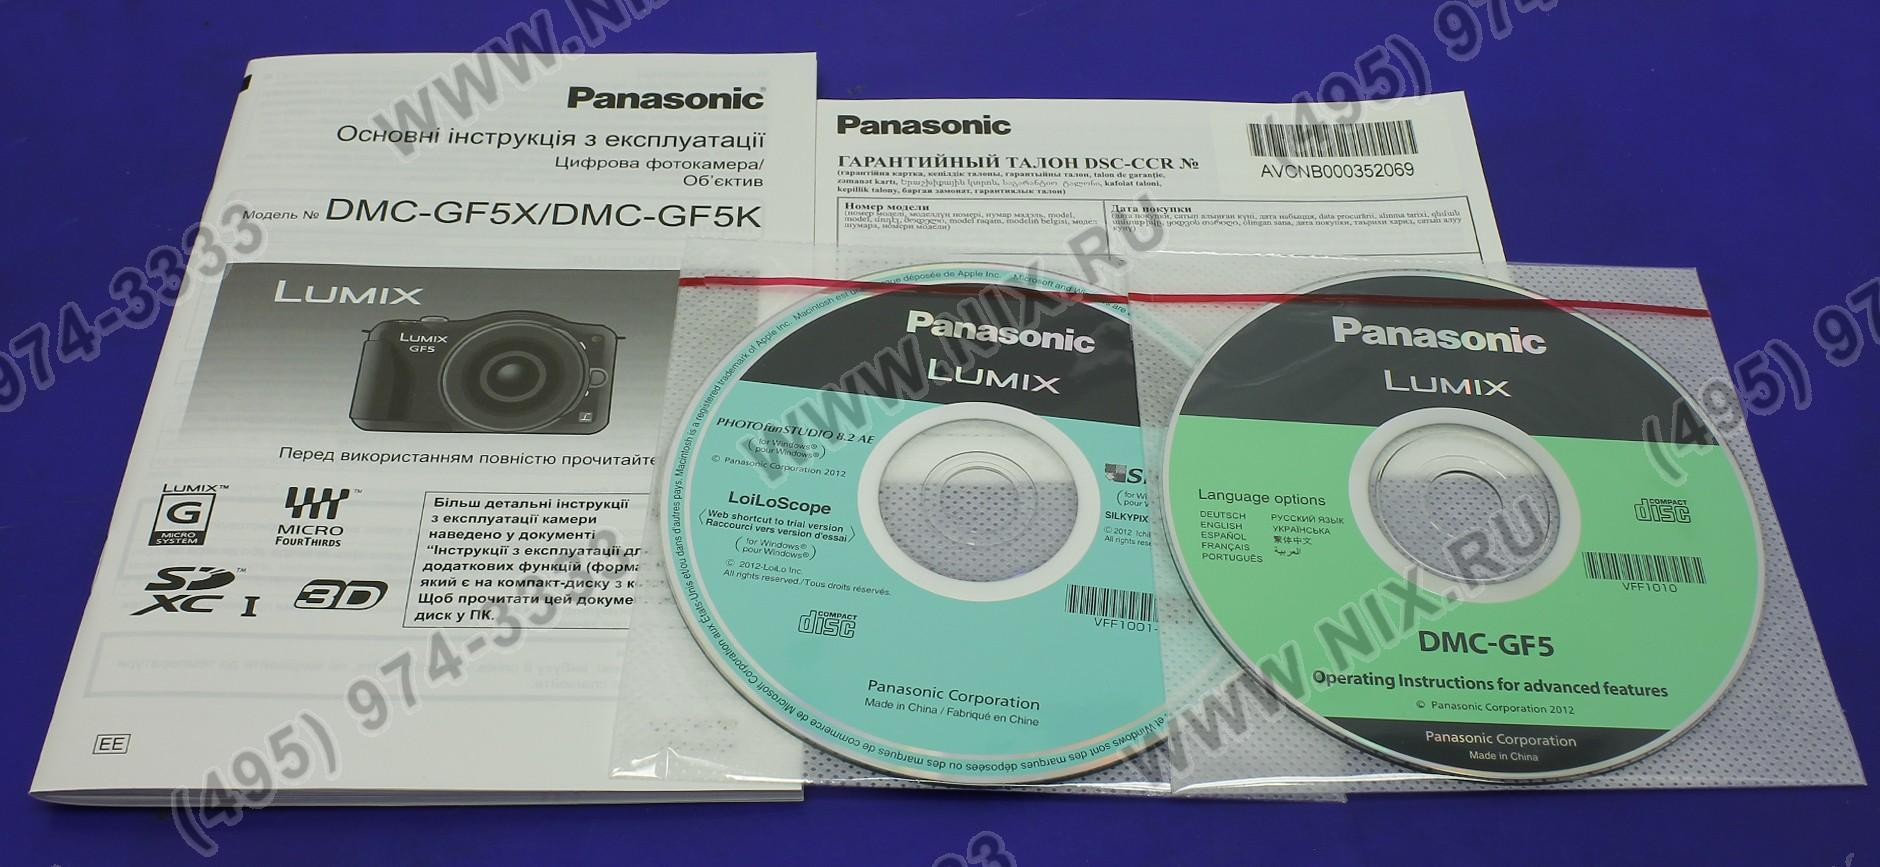 Panasonic Lumix Dmc Gf5x W Afolat